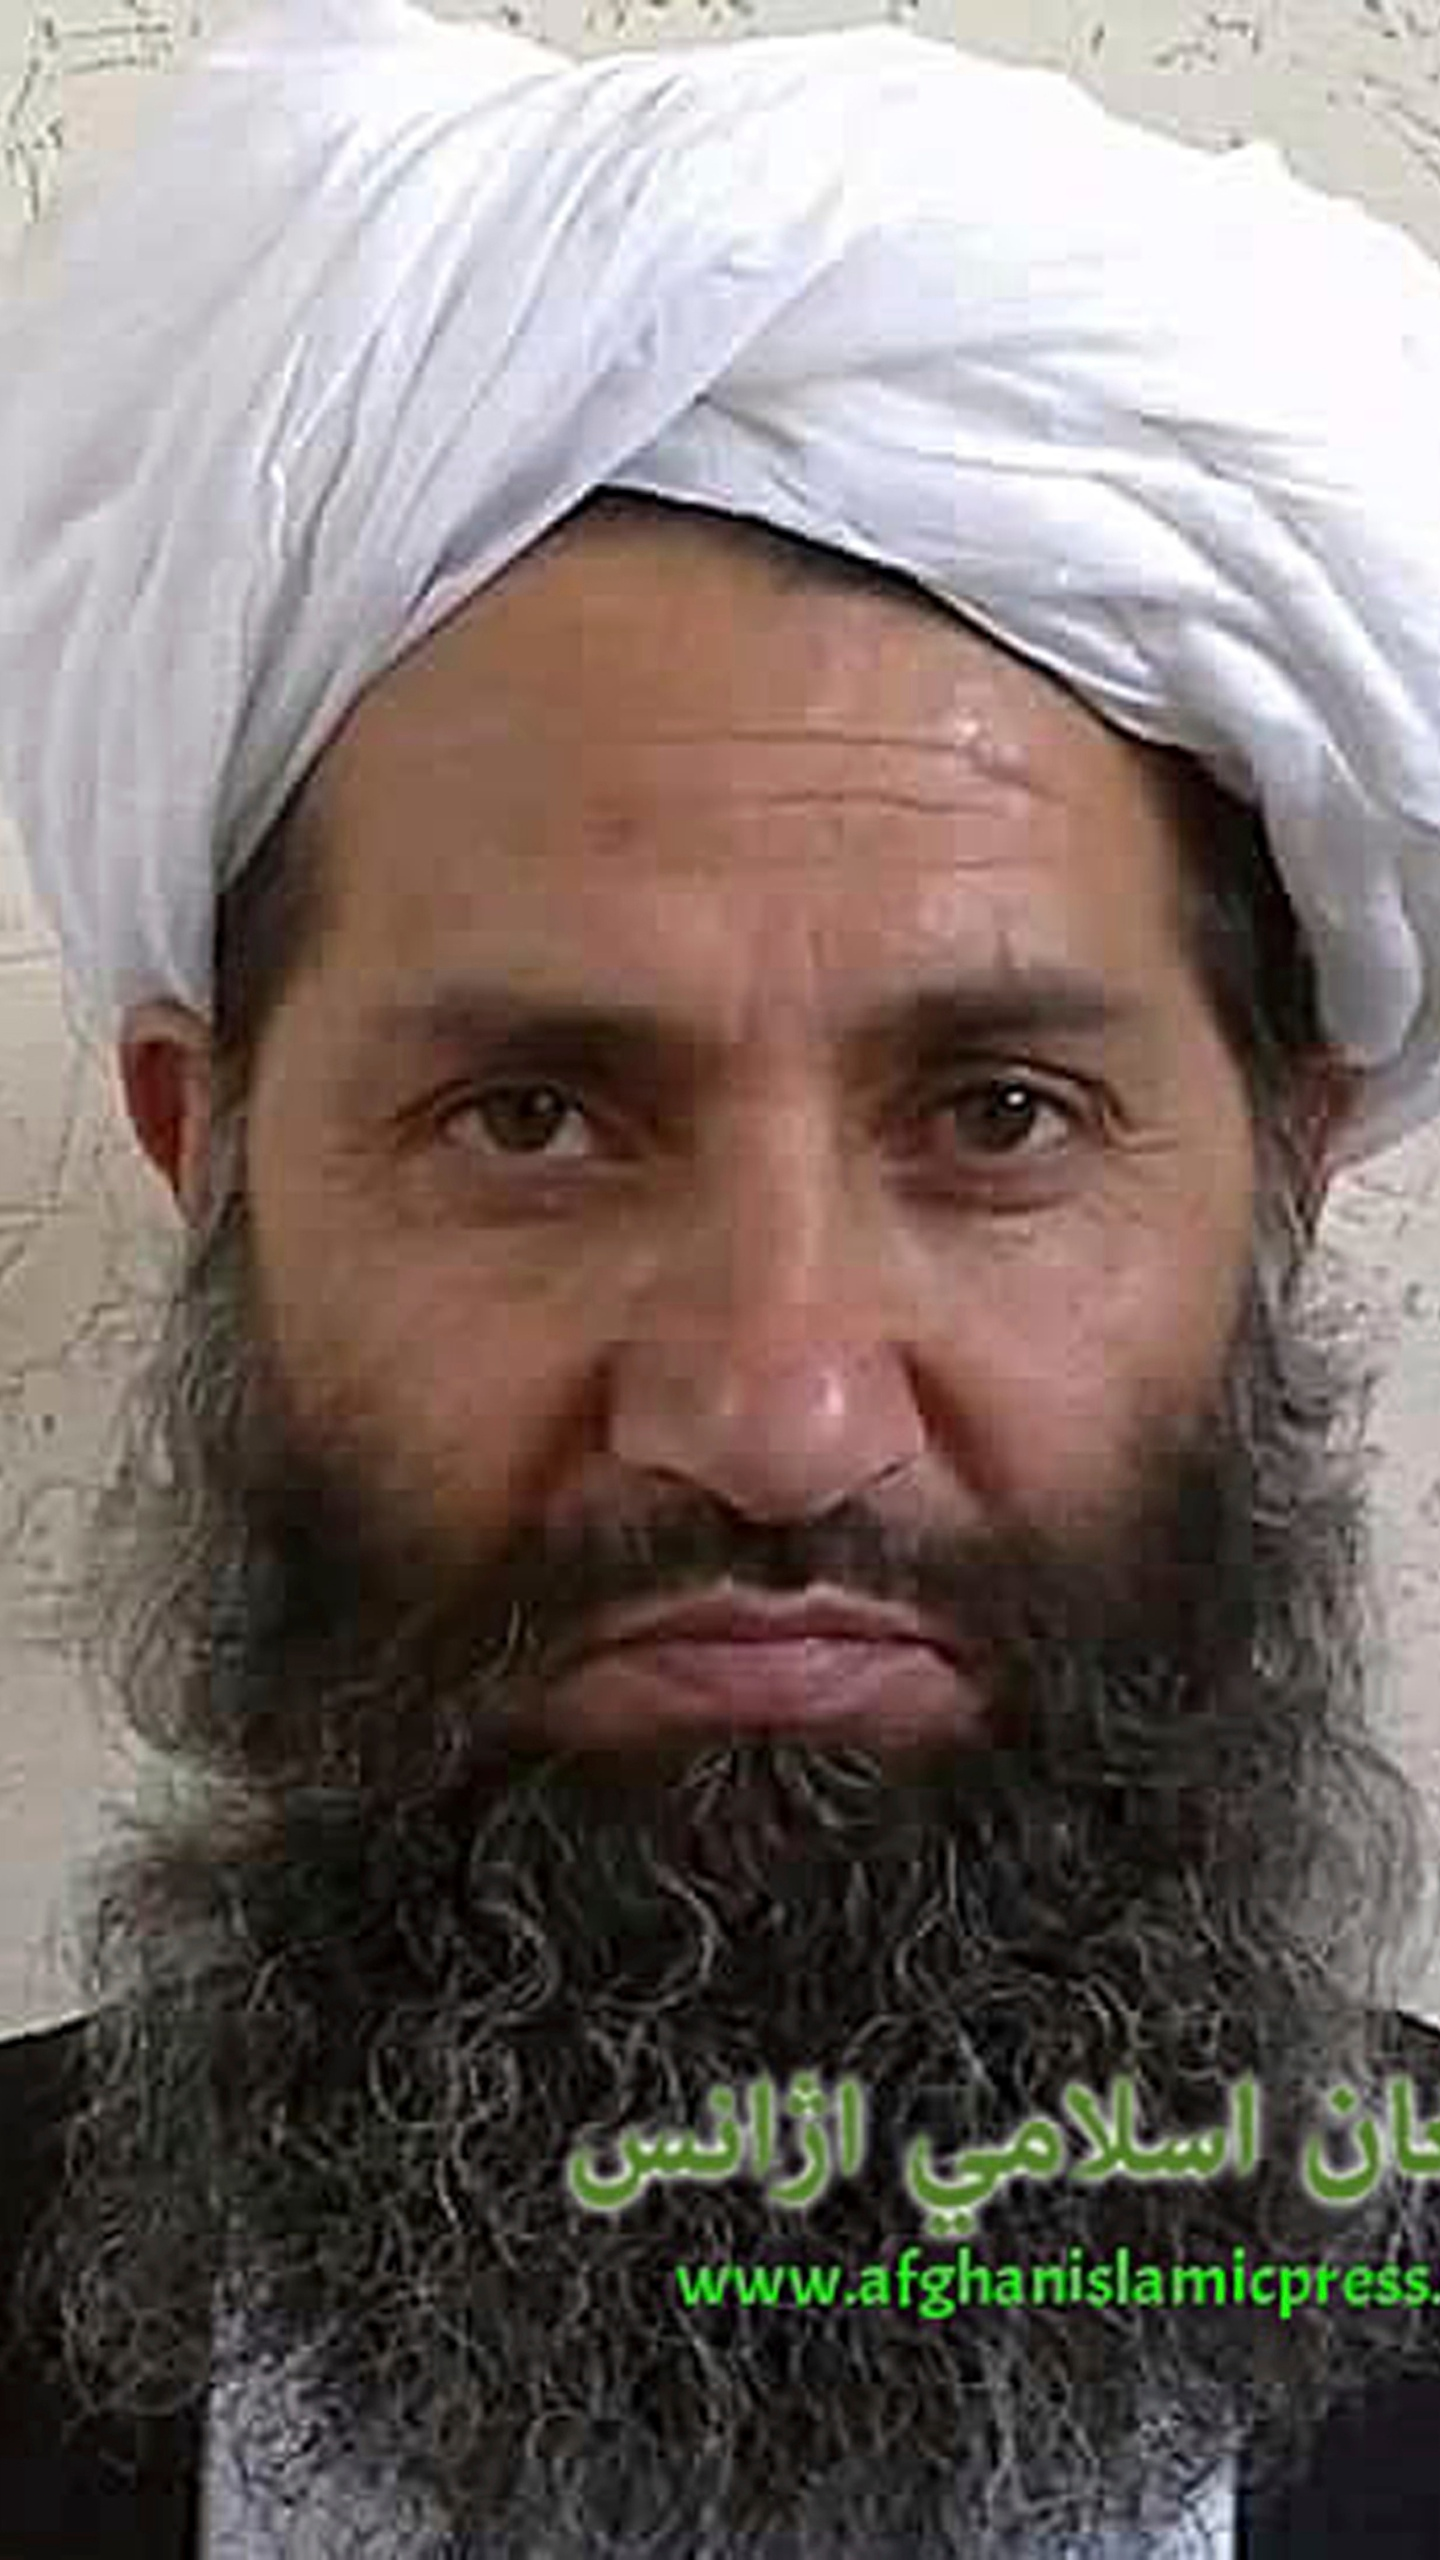 Mawlawi Hibatullah Akhundzada